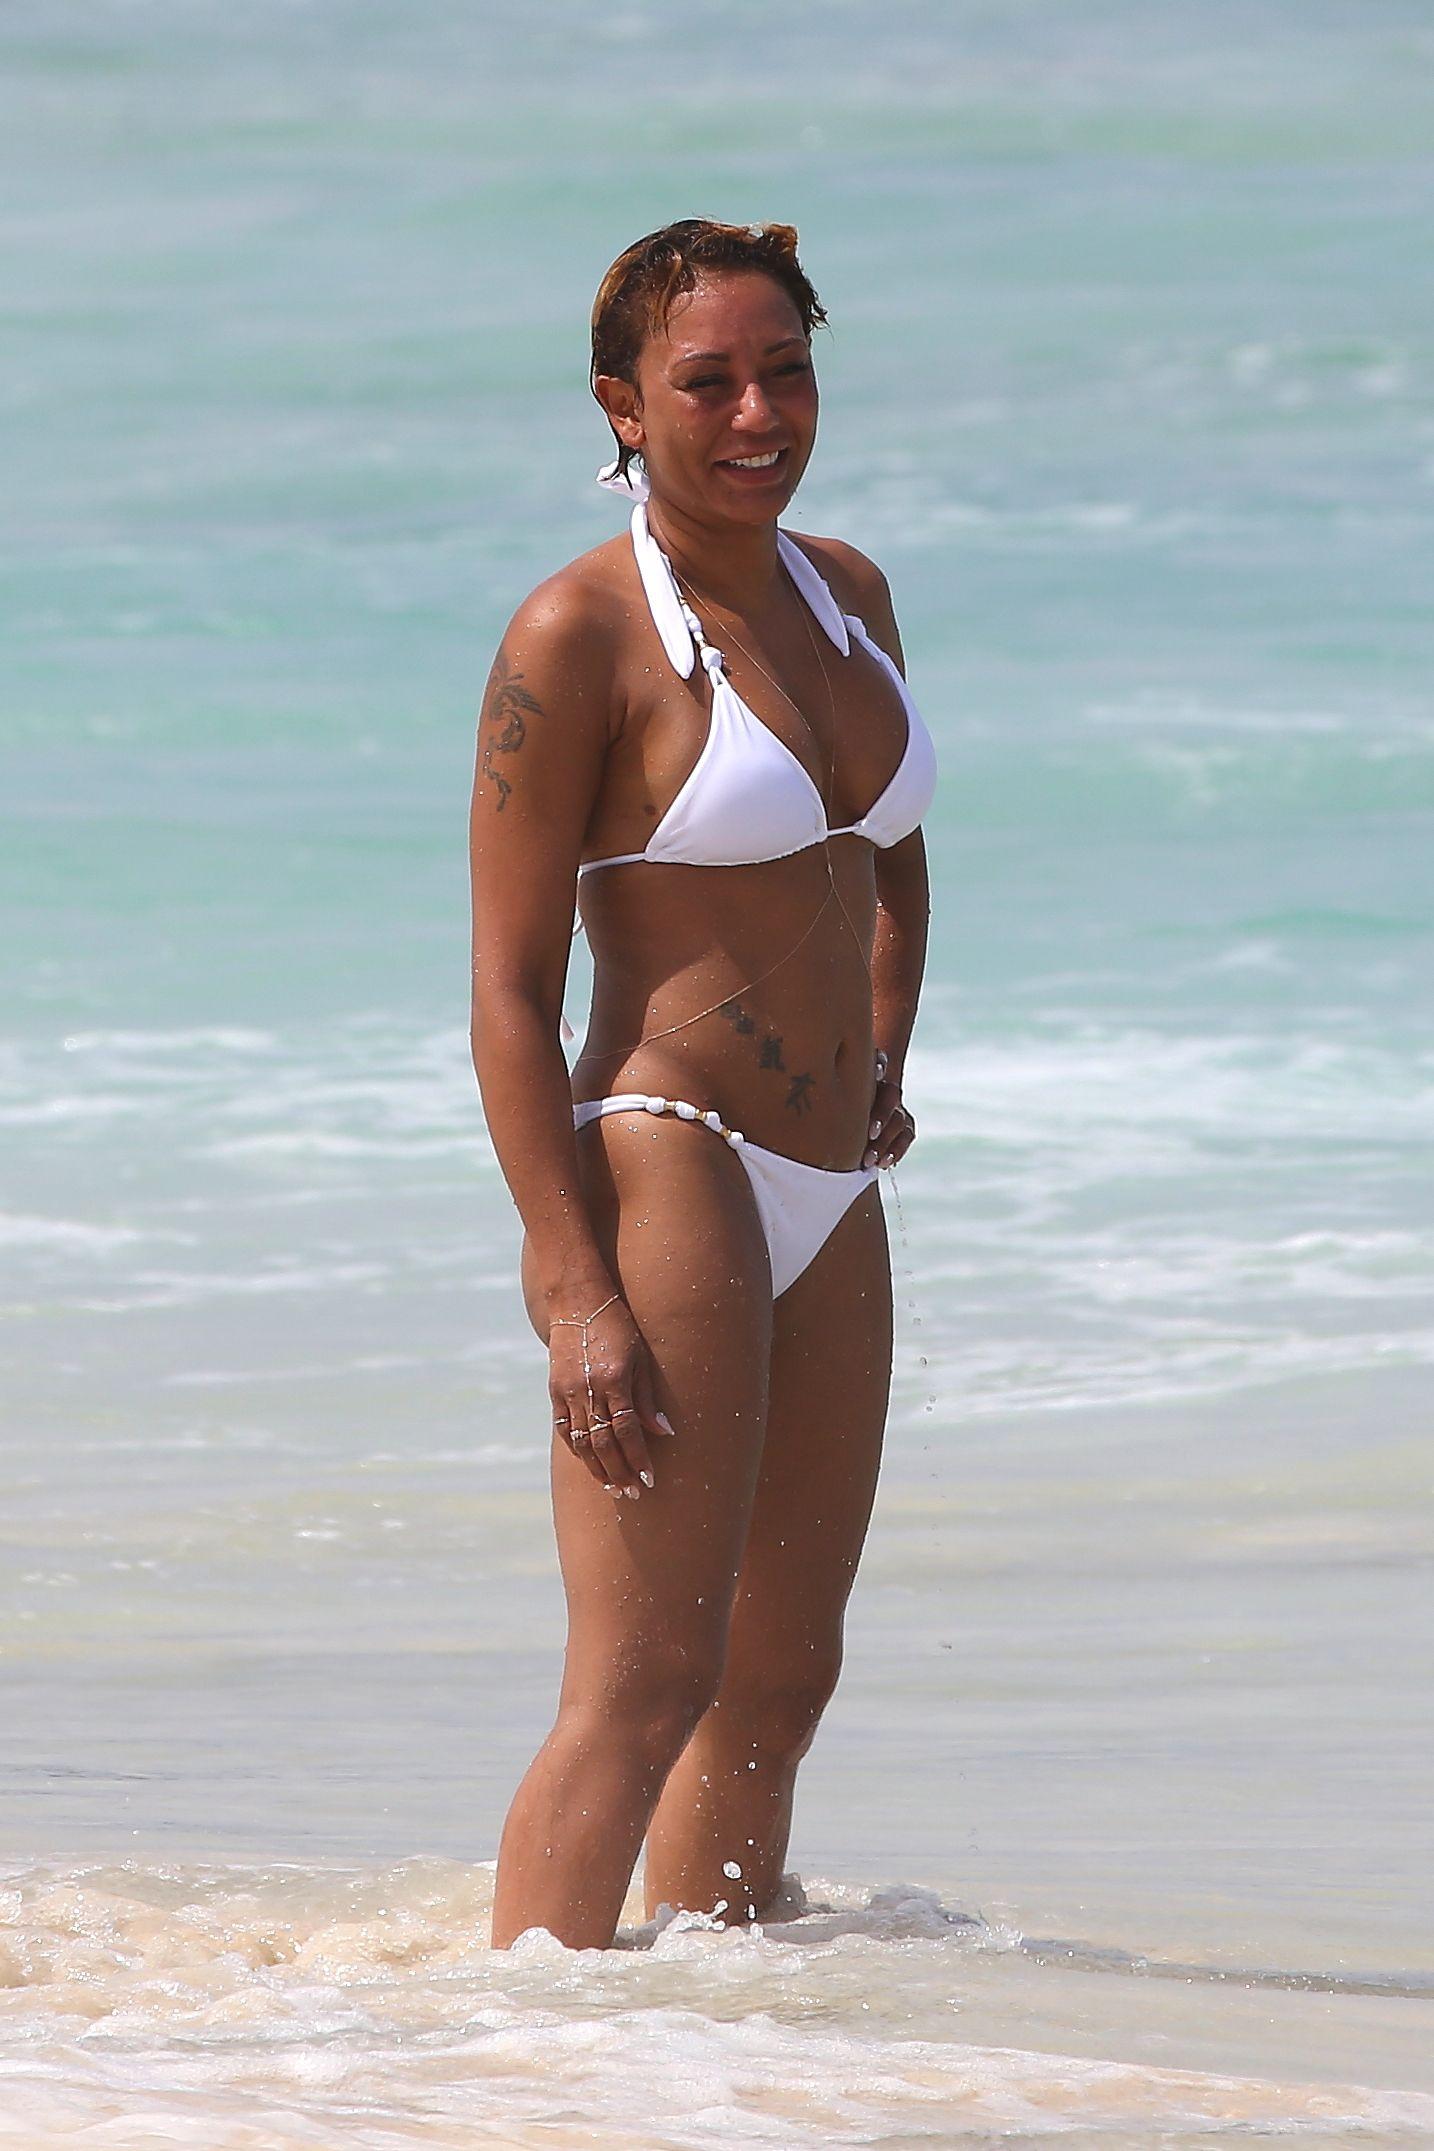 Melanie brown bikini photos